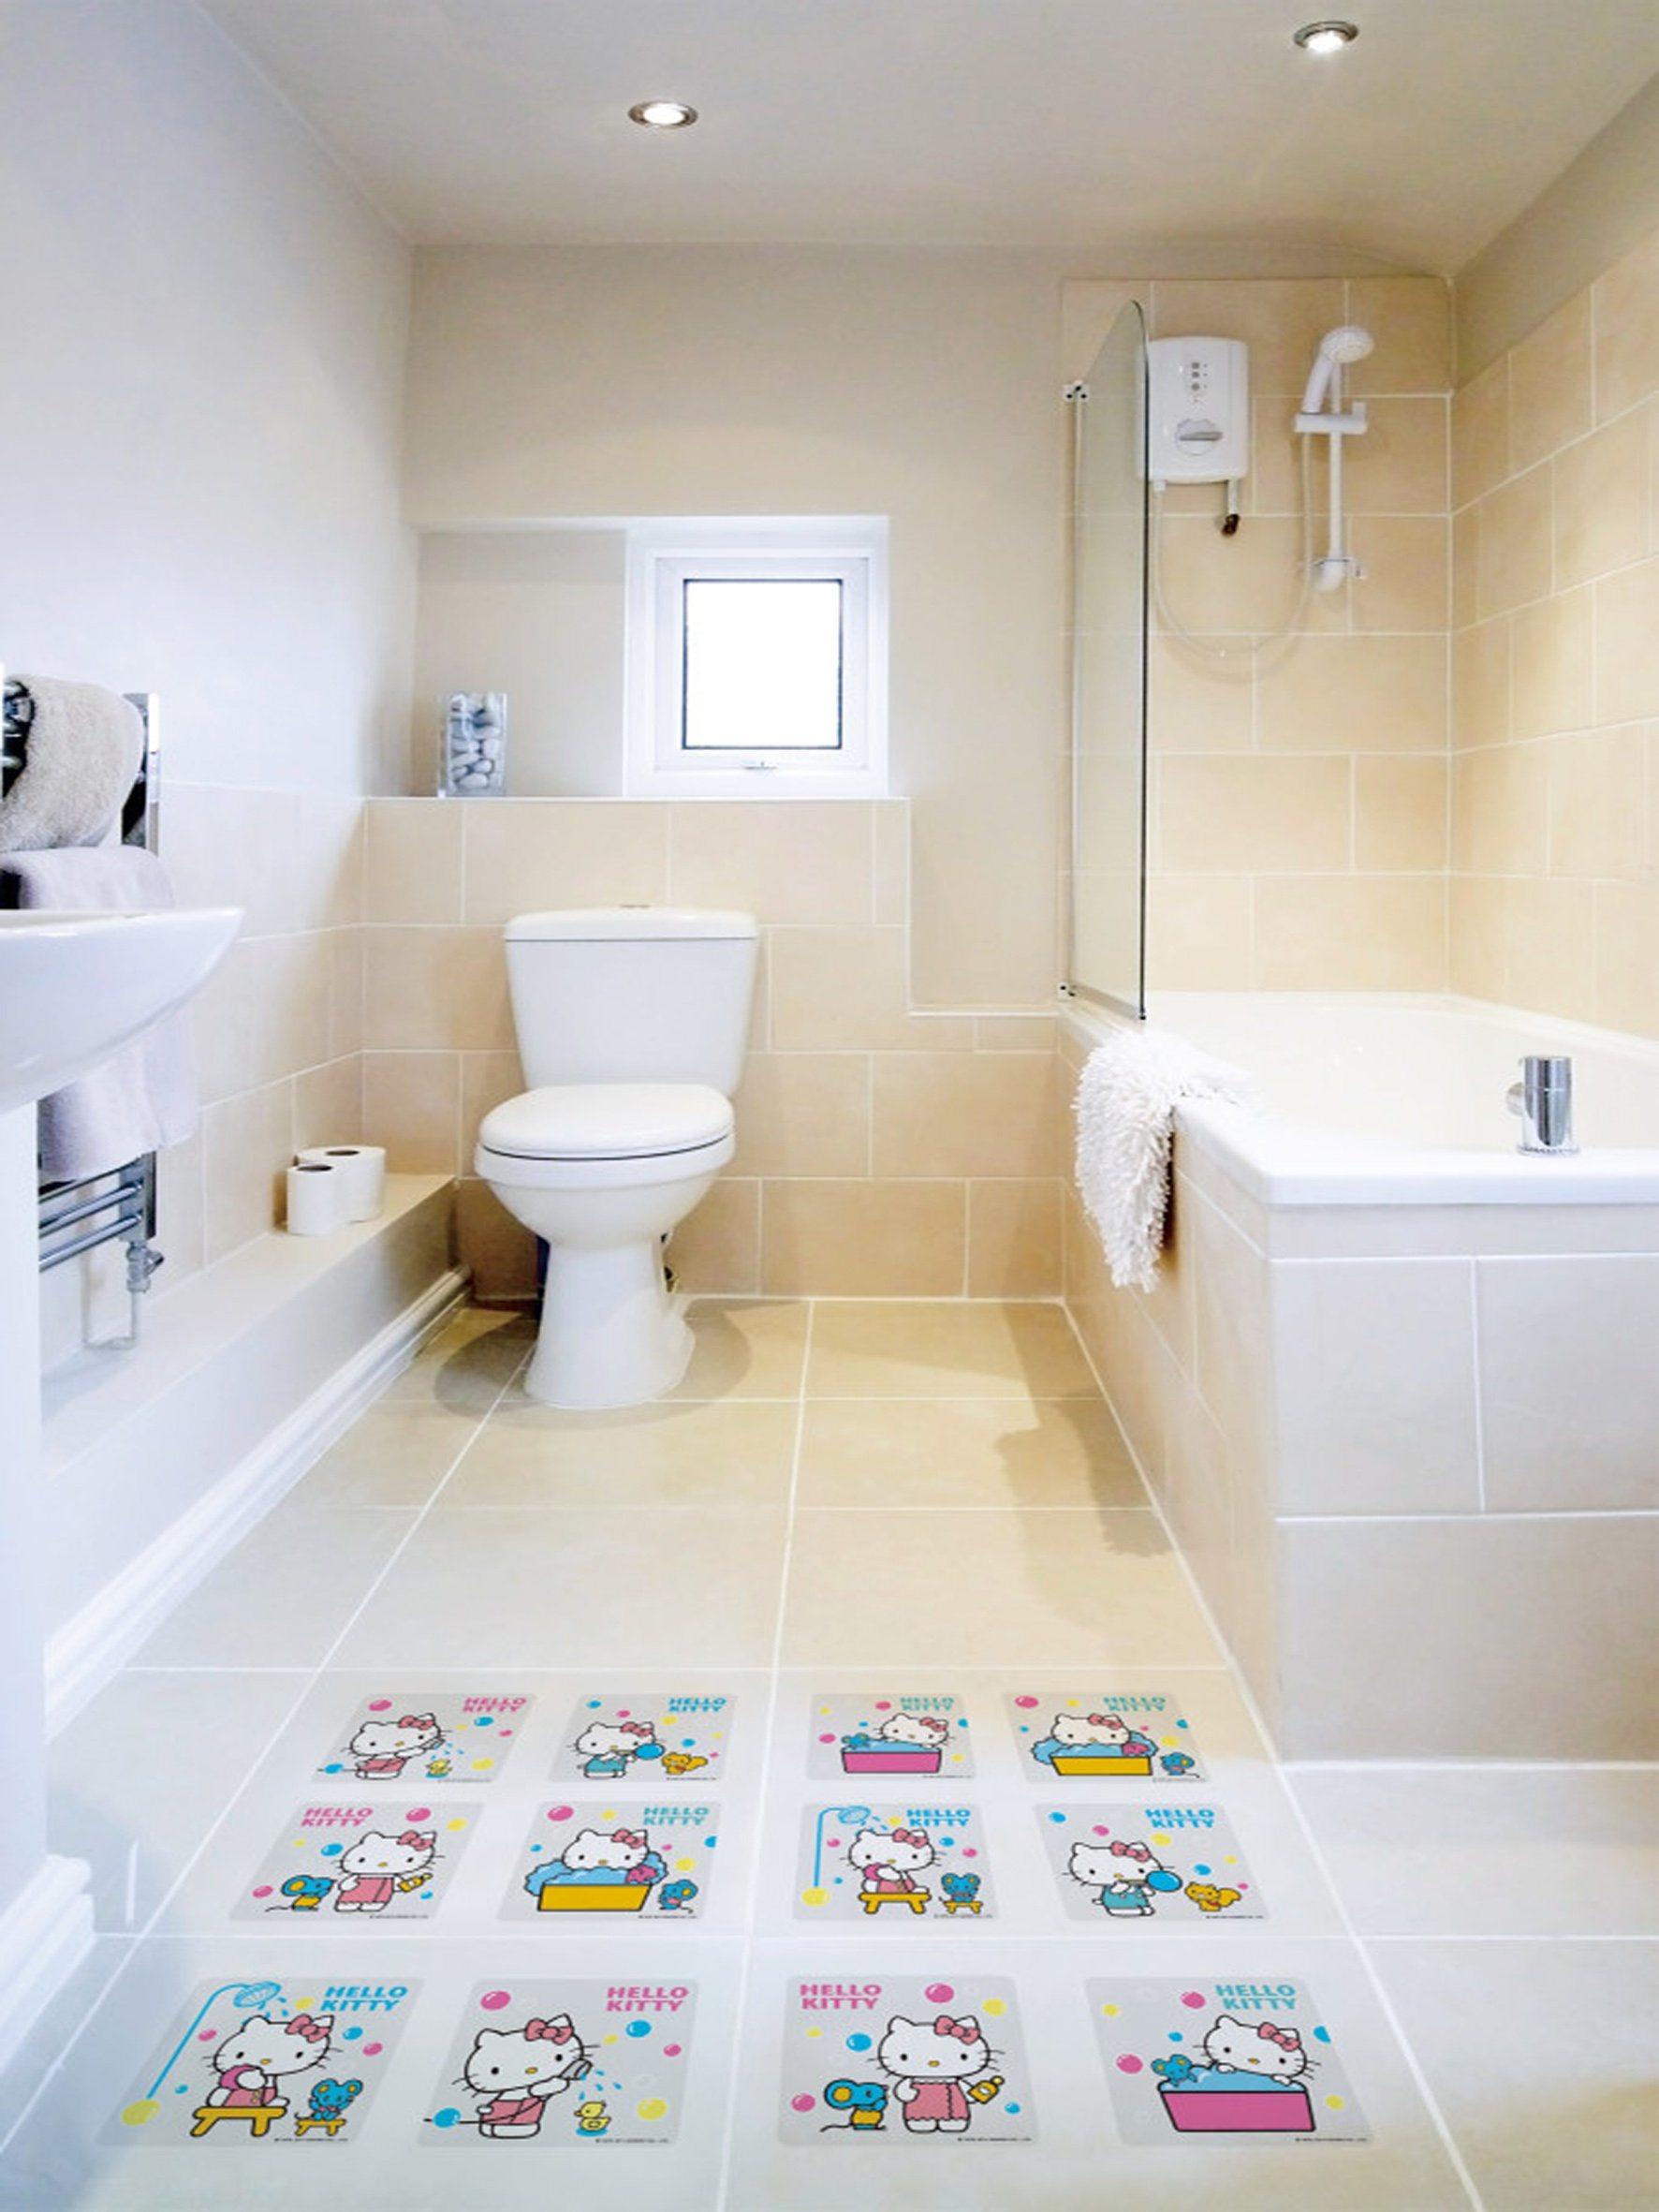 Factory Supply Custom Design Printing Decorative Home PVC Floor Sticker